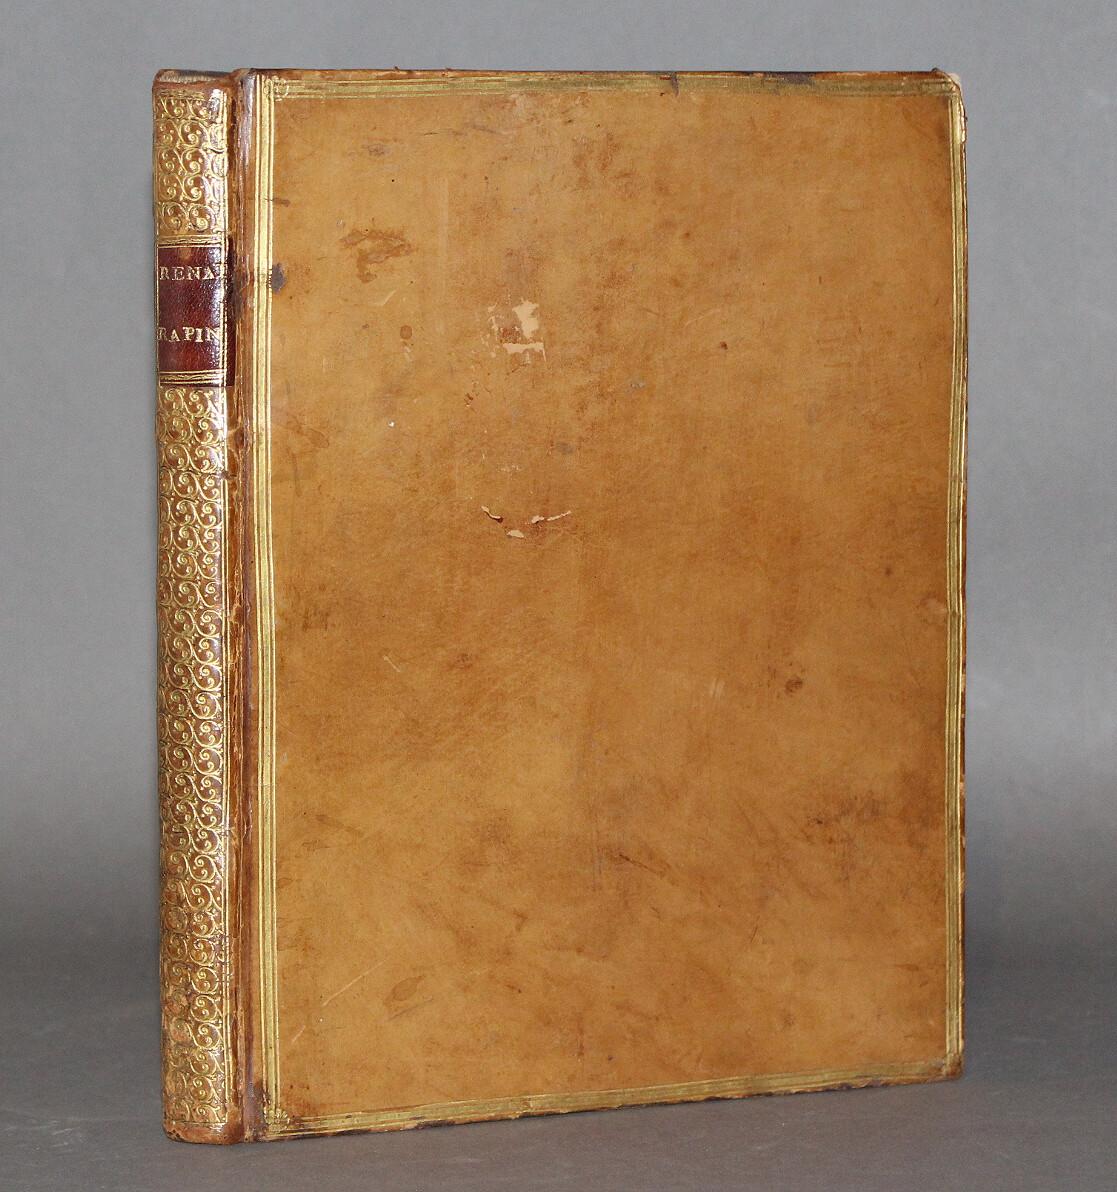 RAPIN.- Hortorum libri IV cum disputatione de cultura Hortensi, 1665. Bel exemplaire.